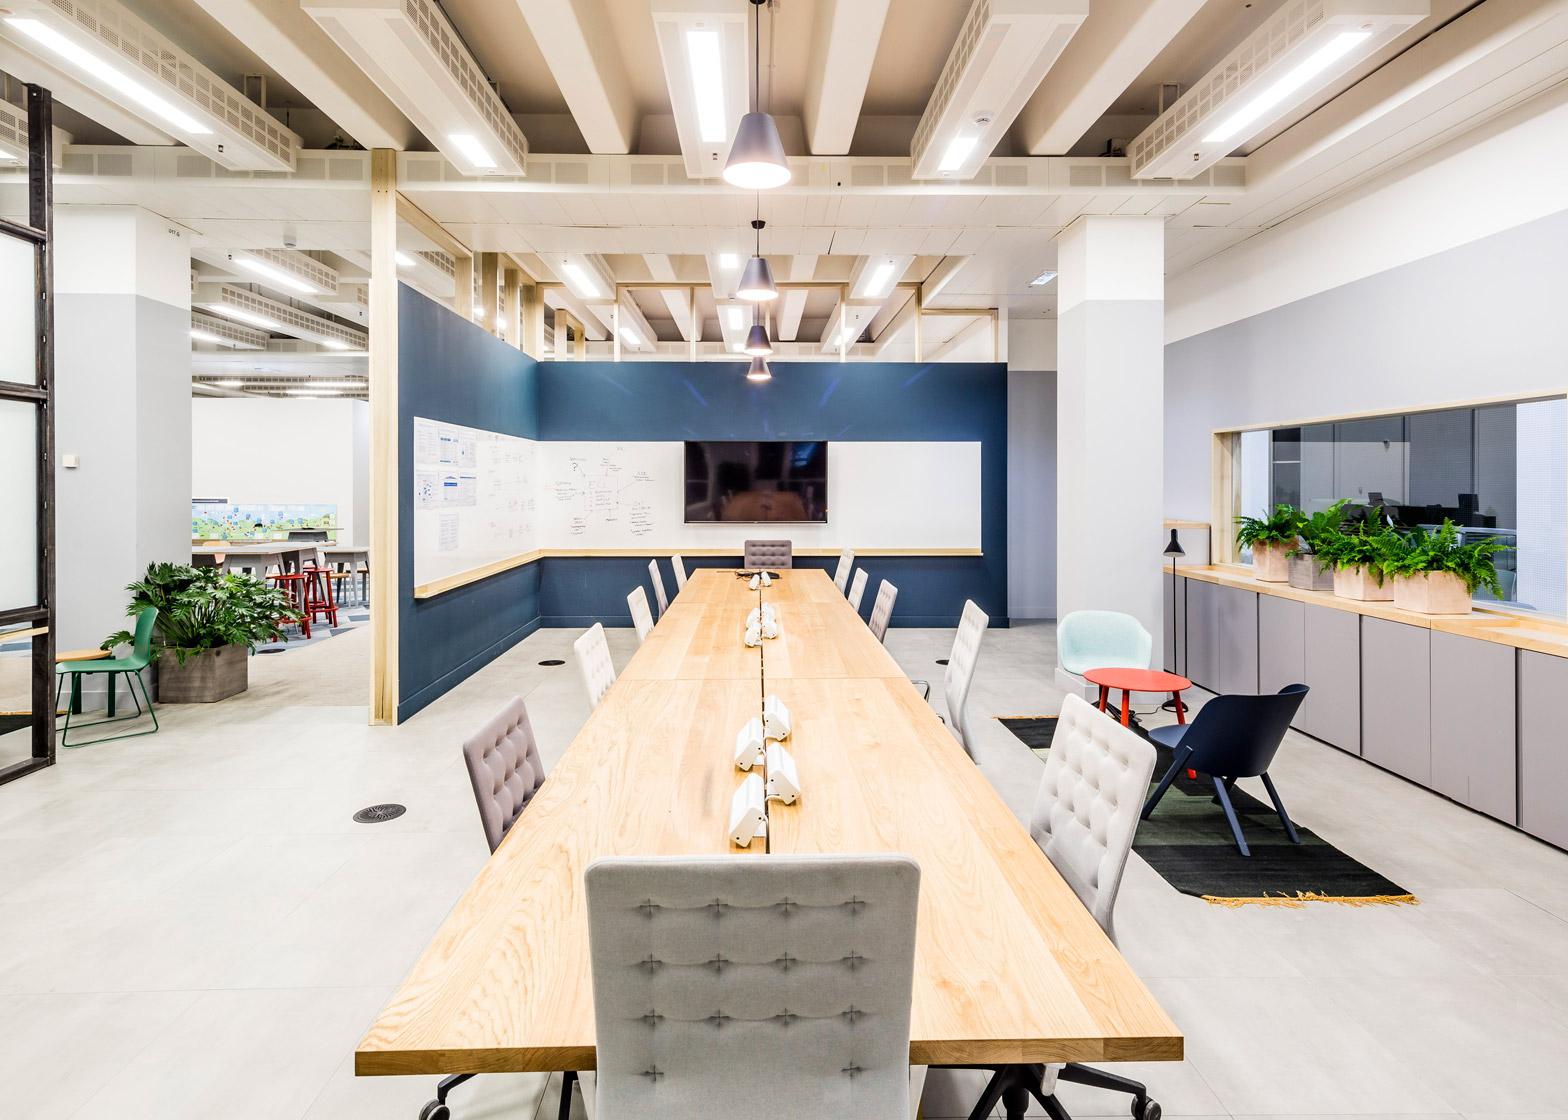 barclaycard-agile-workplace-APA-london-interior-design_dezeen_1568_13